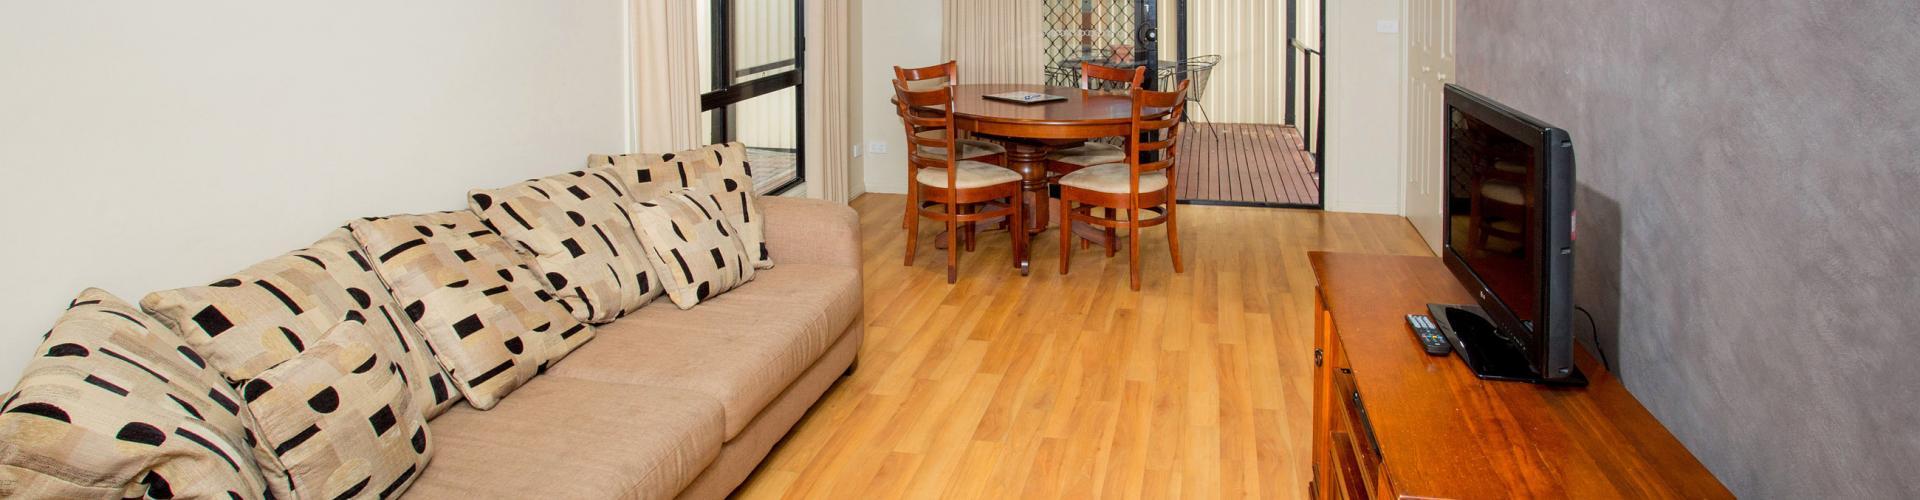 BIG4 Traralgon Park Lane Holiday Park - Family Cabin - Sleeps 4 - Living Area